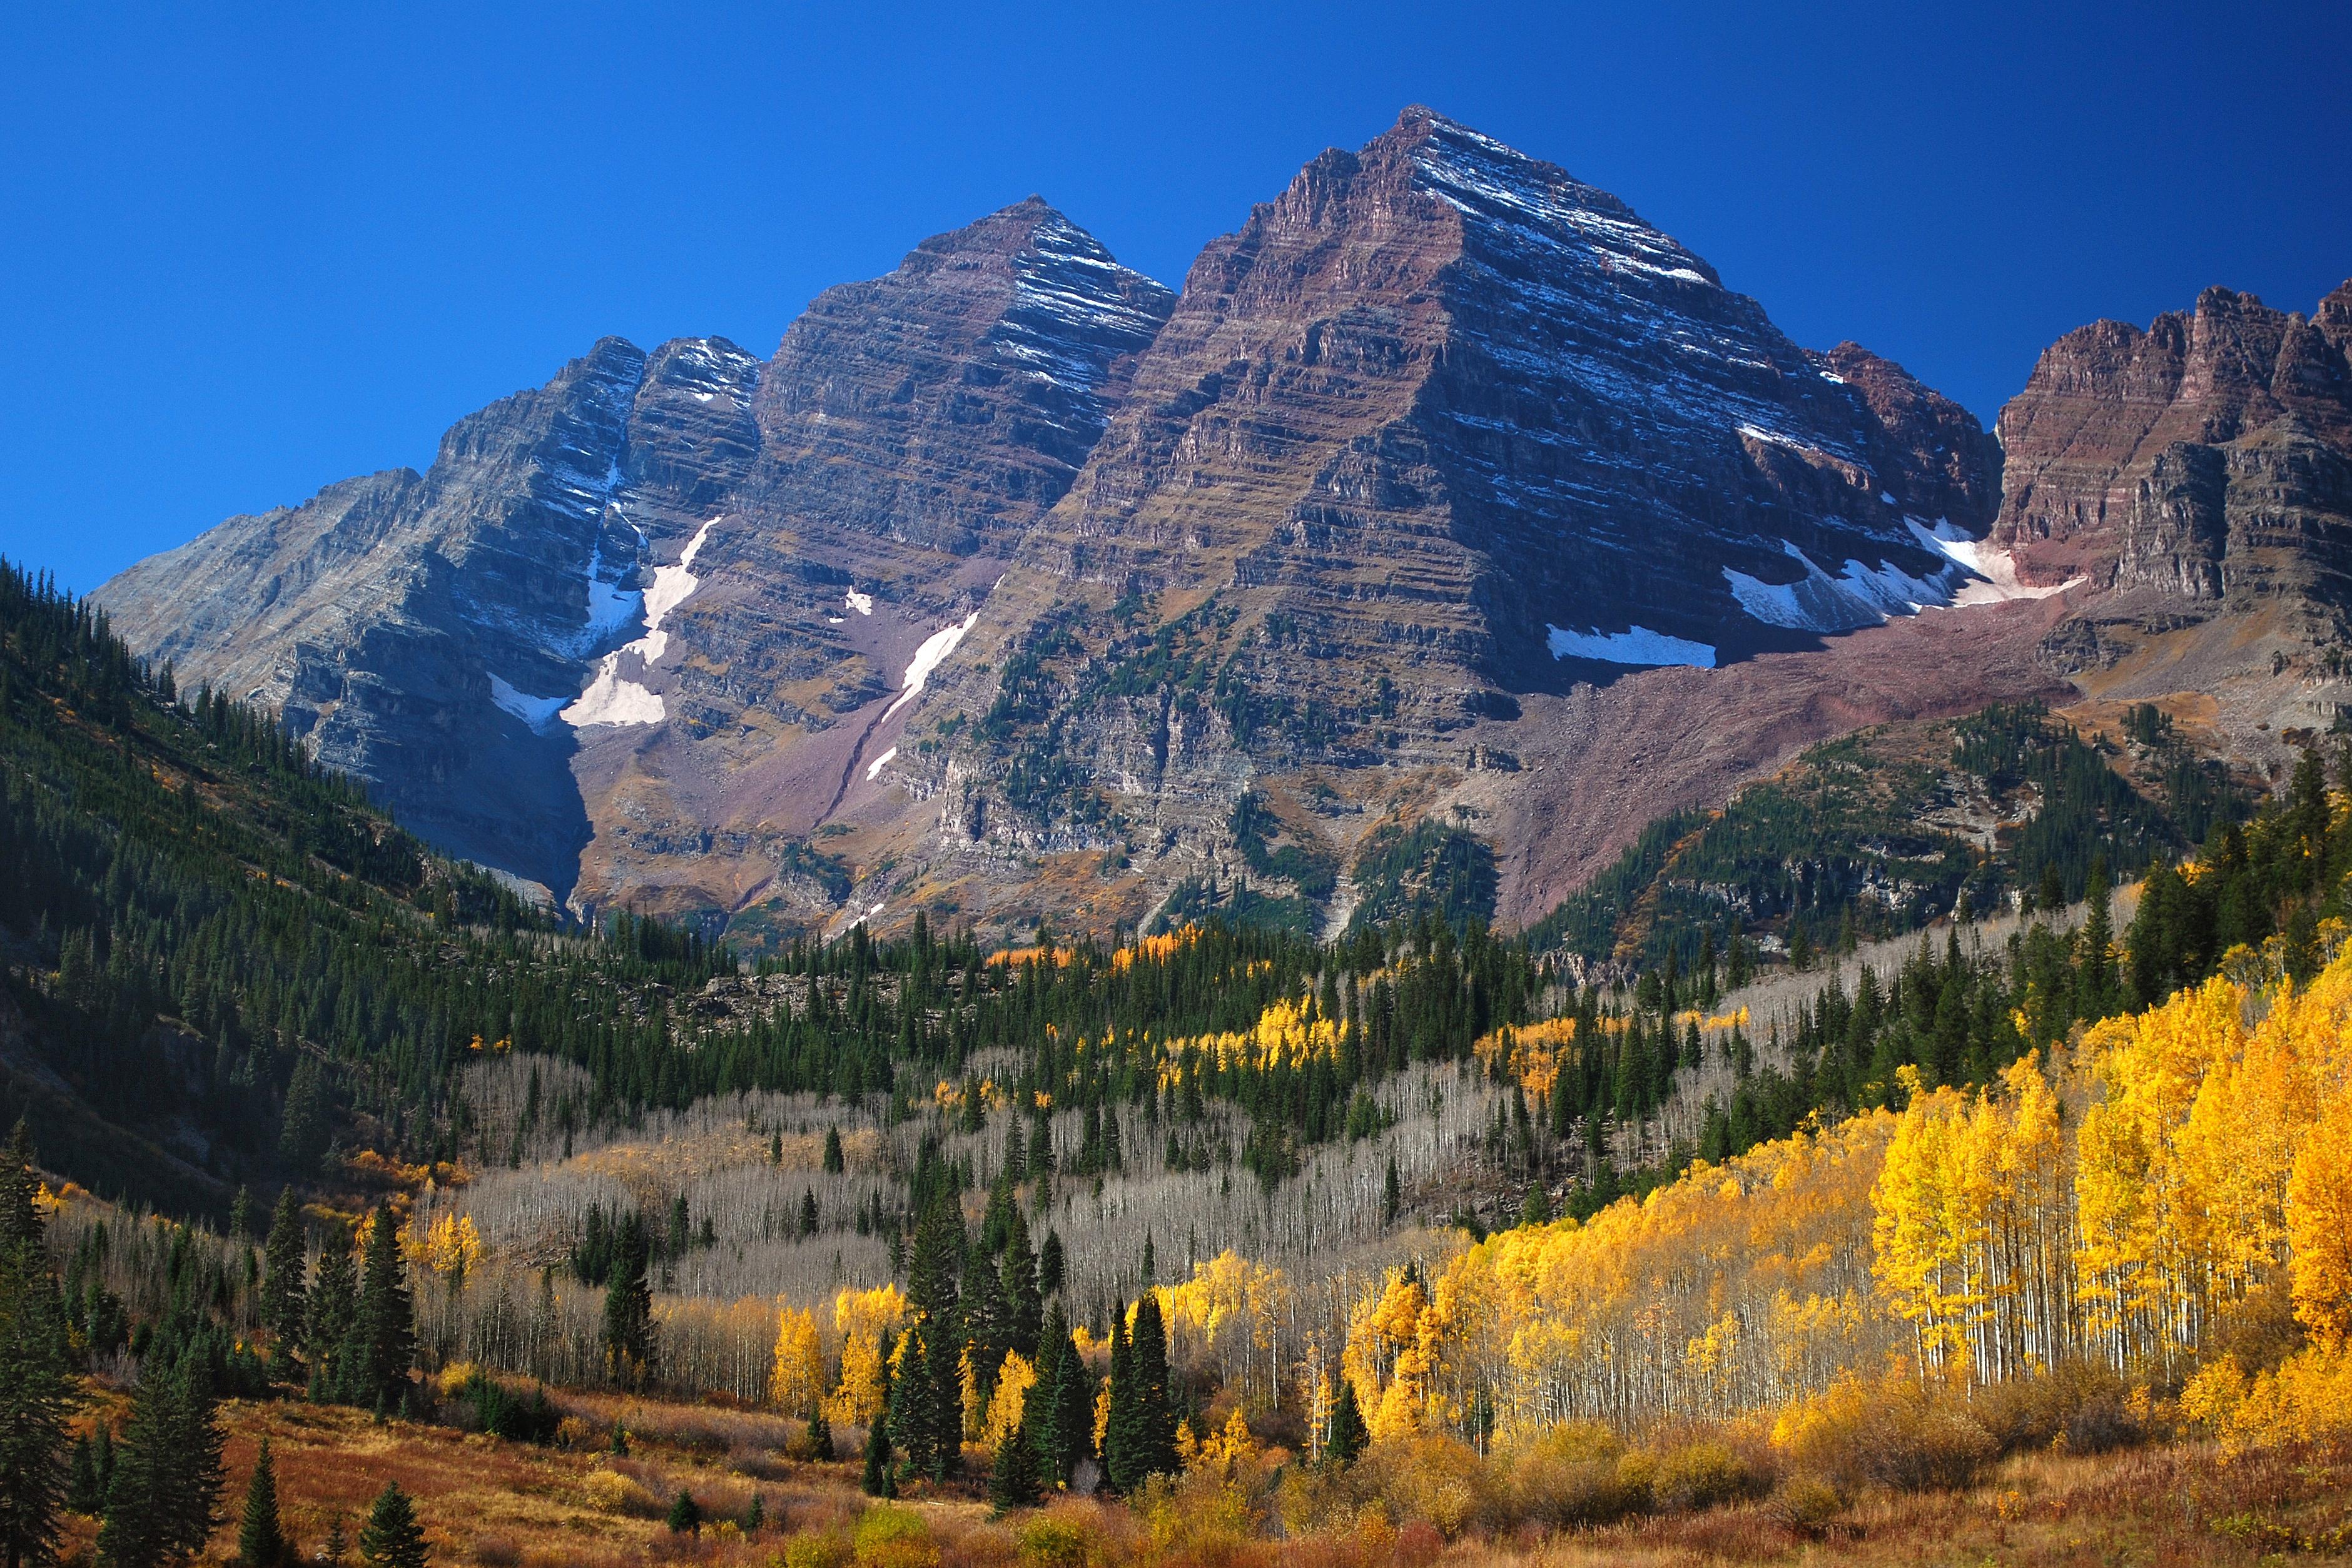 Red Mountain, Uncompahgre National Forest, Colorado  № 1563824 загрузить